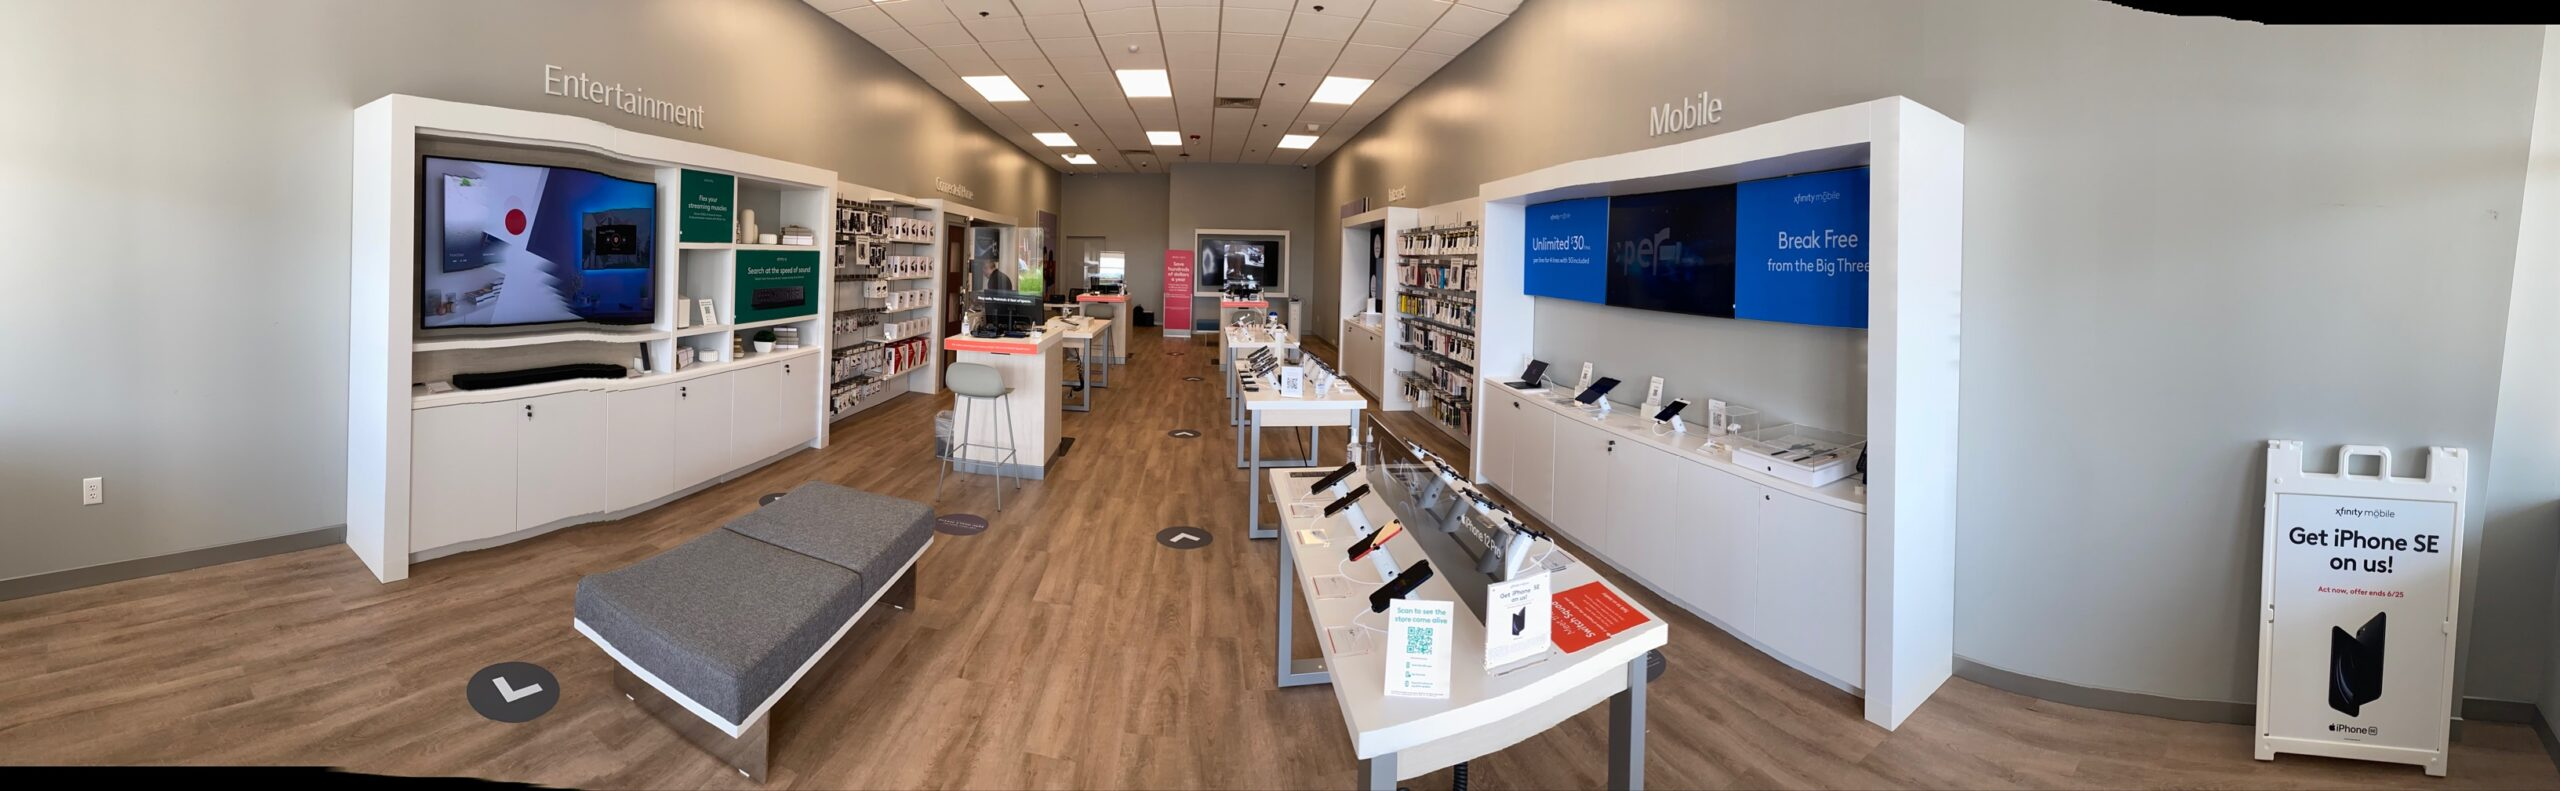 Hummelstown Xfinity Store